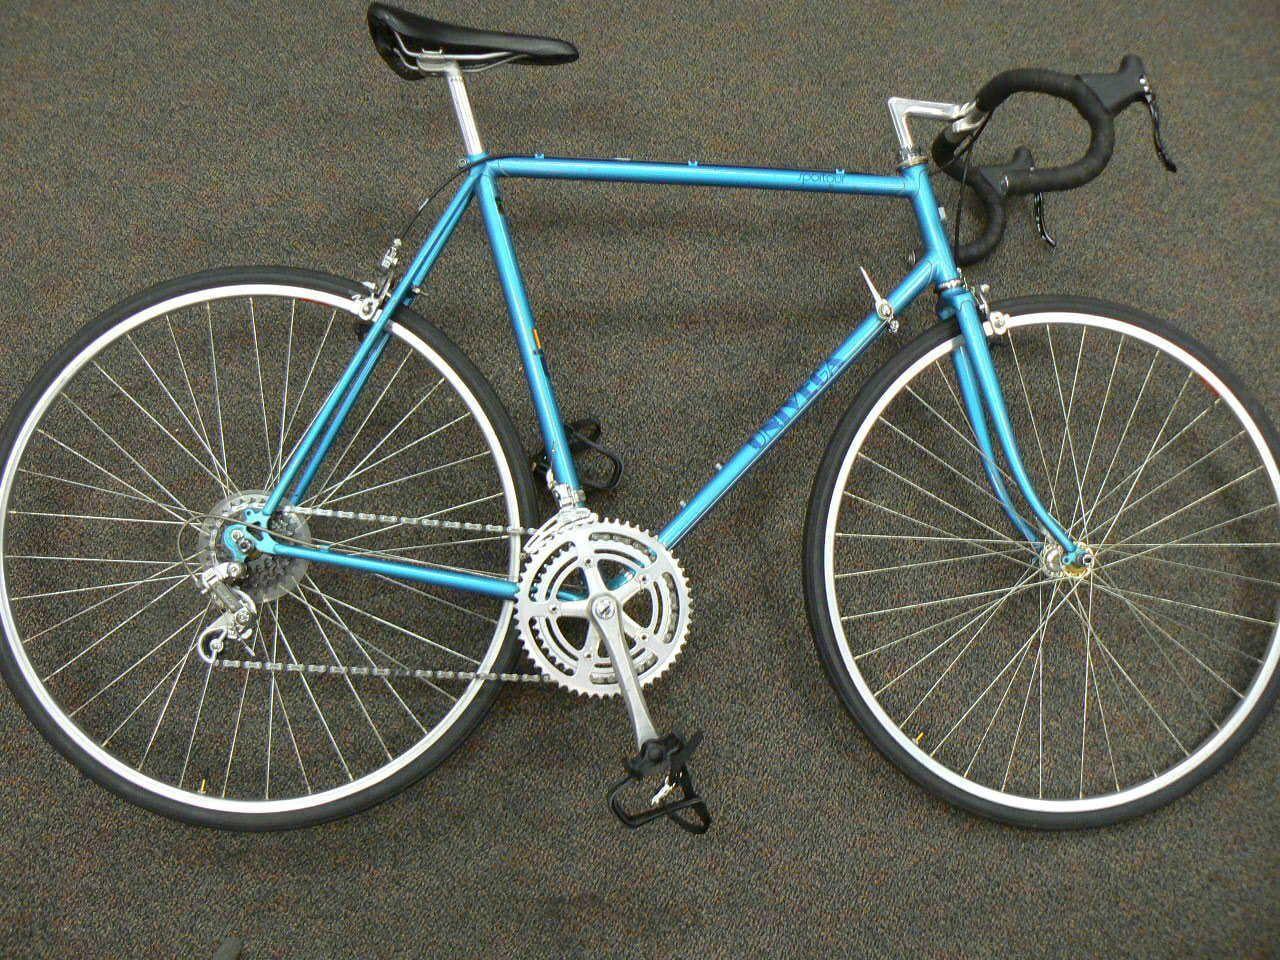 My 1981 Univega Sportour Road Bike I Recently Started Riding It